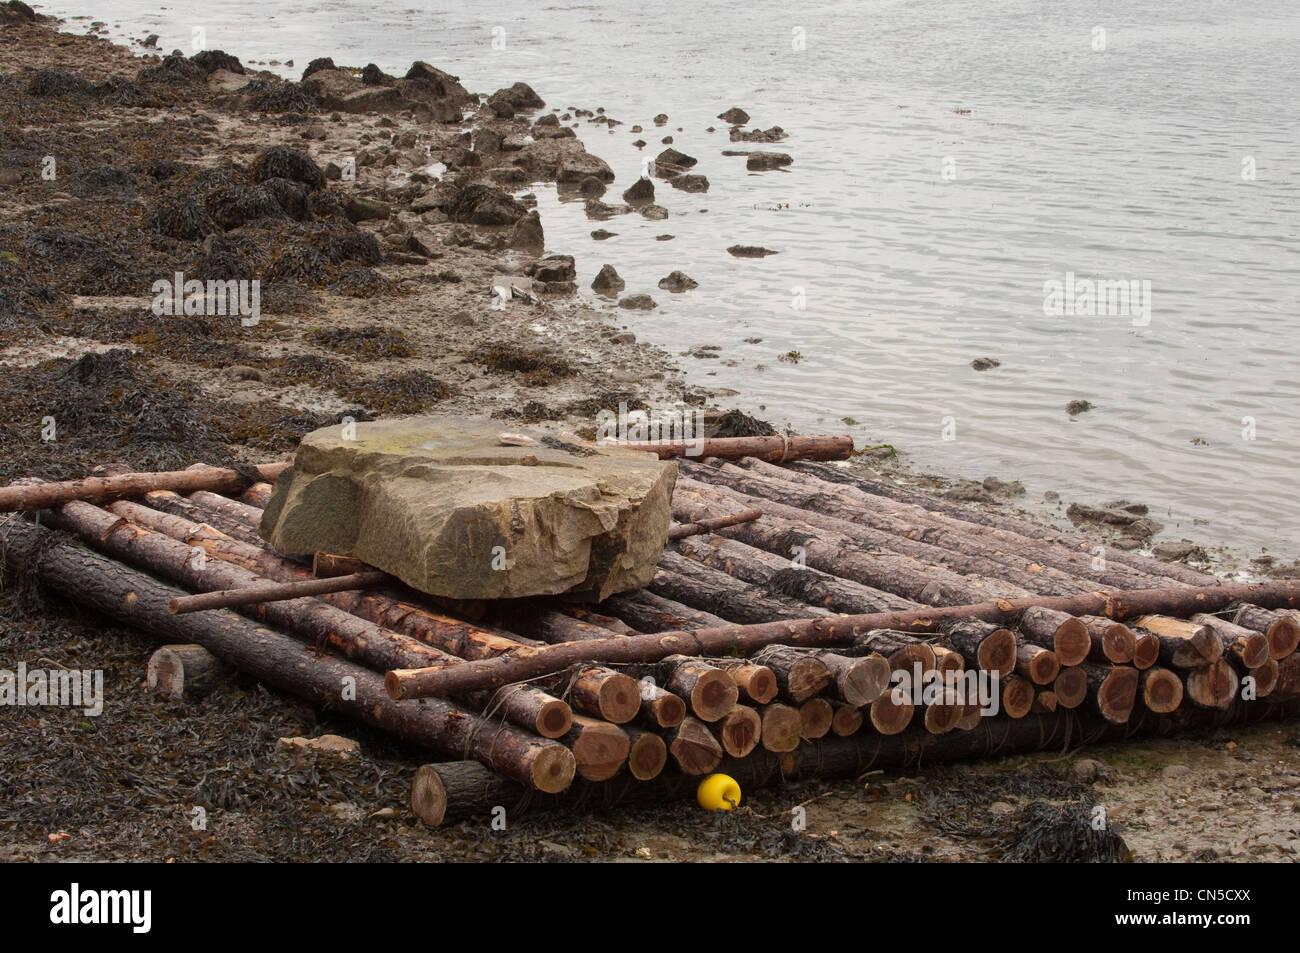 France, Morbihan, Golfe du Morbihan, Larmor Baden, experience of floating raft on Gavrinis island, to understand - Stock Image